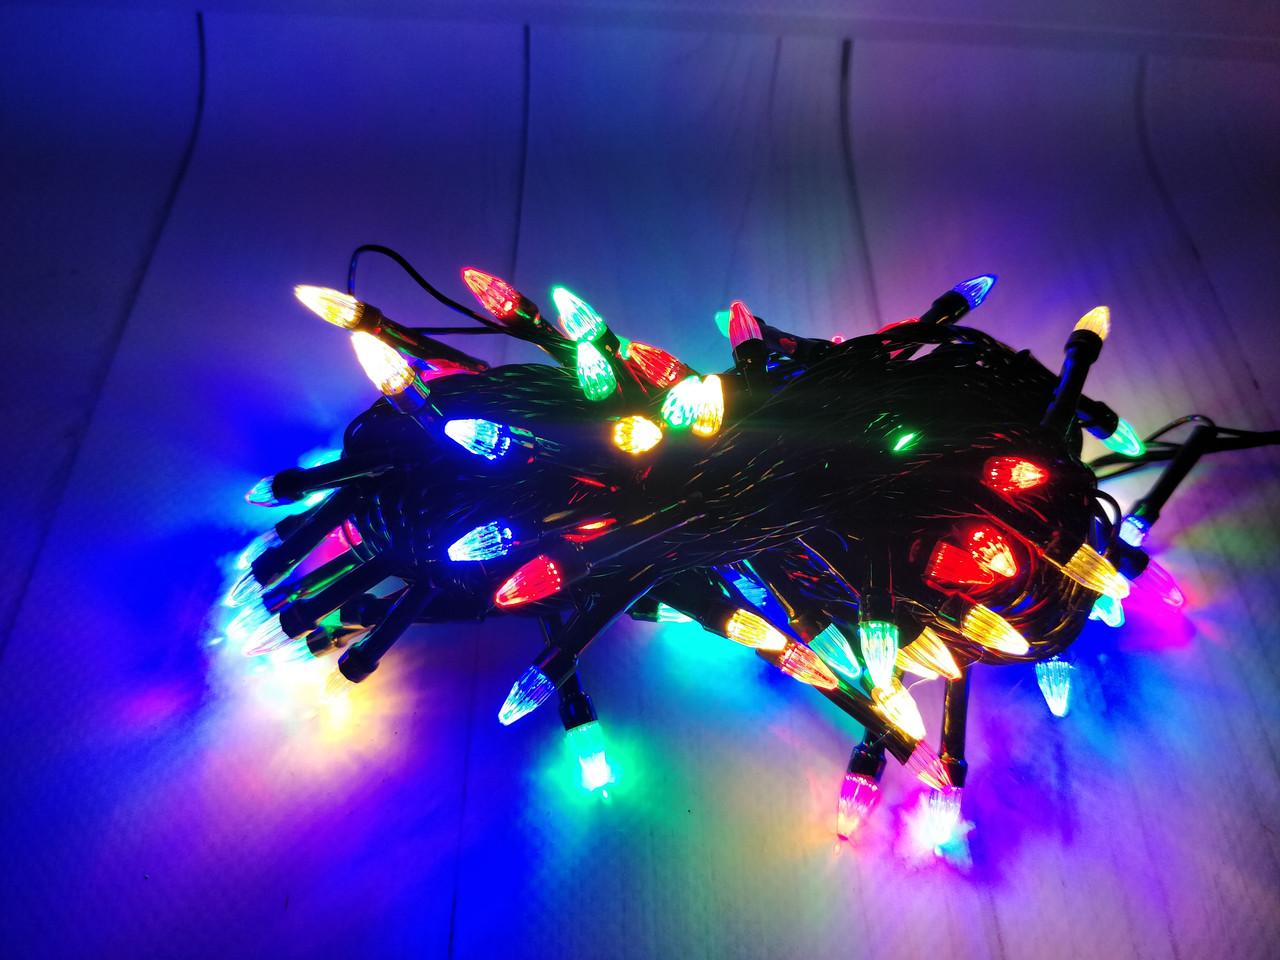 Гирлянда LED разноцветная конус 100 ламп Длина 8м на черном проводе